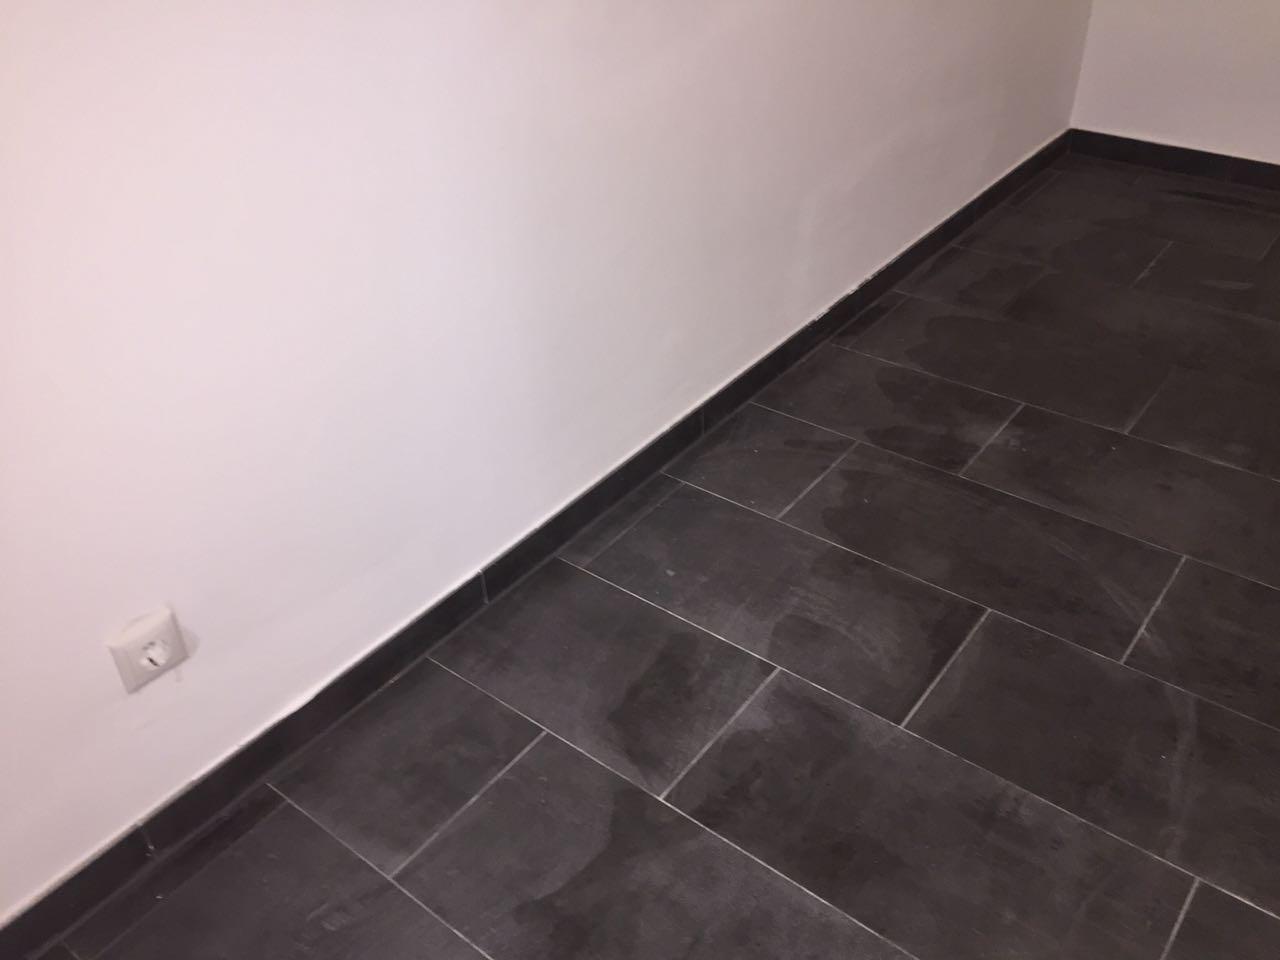 Fliesen verlegen Braunschweig - GEMACHT-GETAN